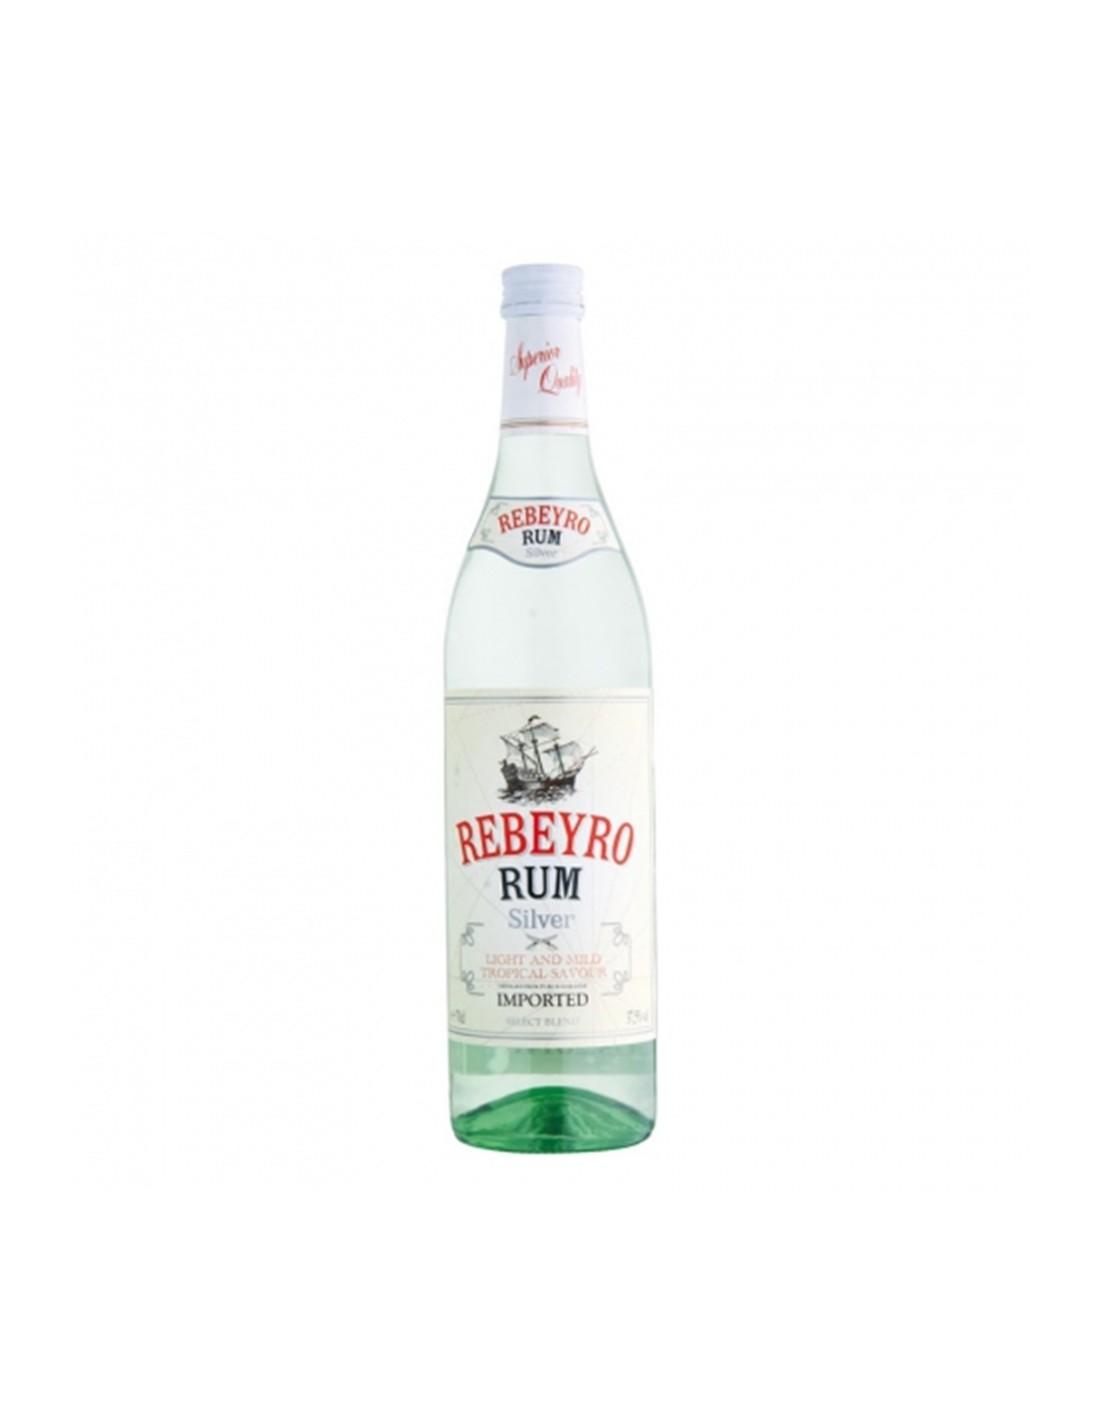 Rom alb Rebeyro Silver, 37.5% alc., 0.7L, Germania